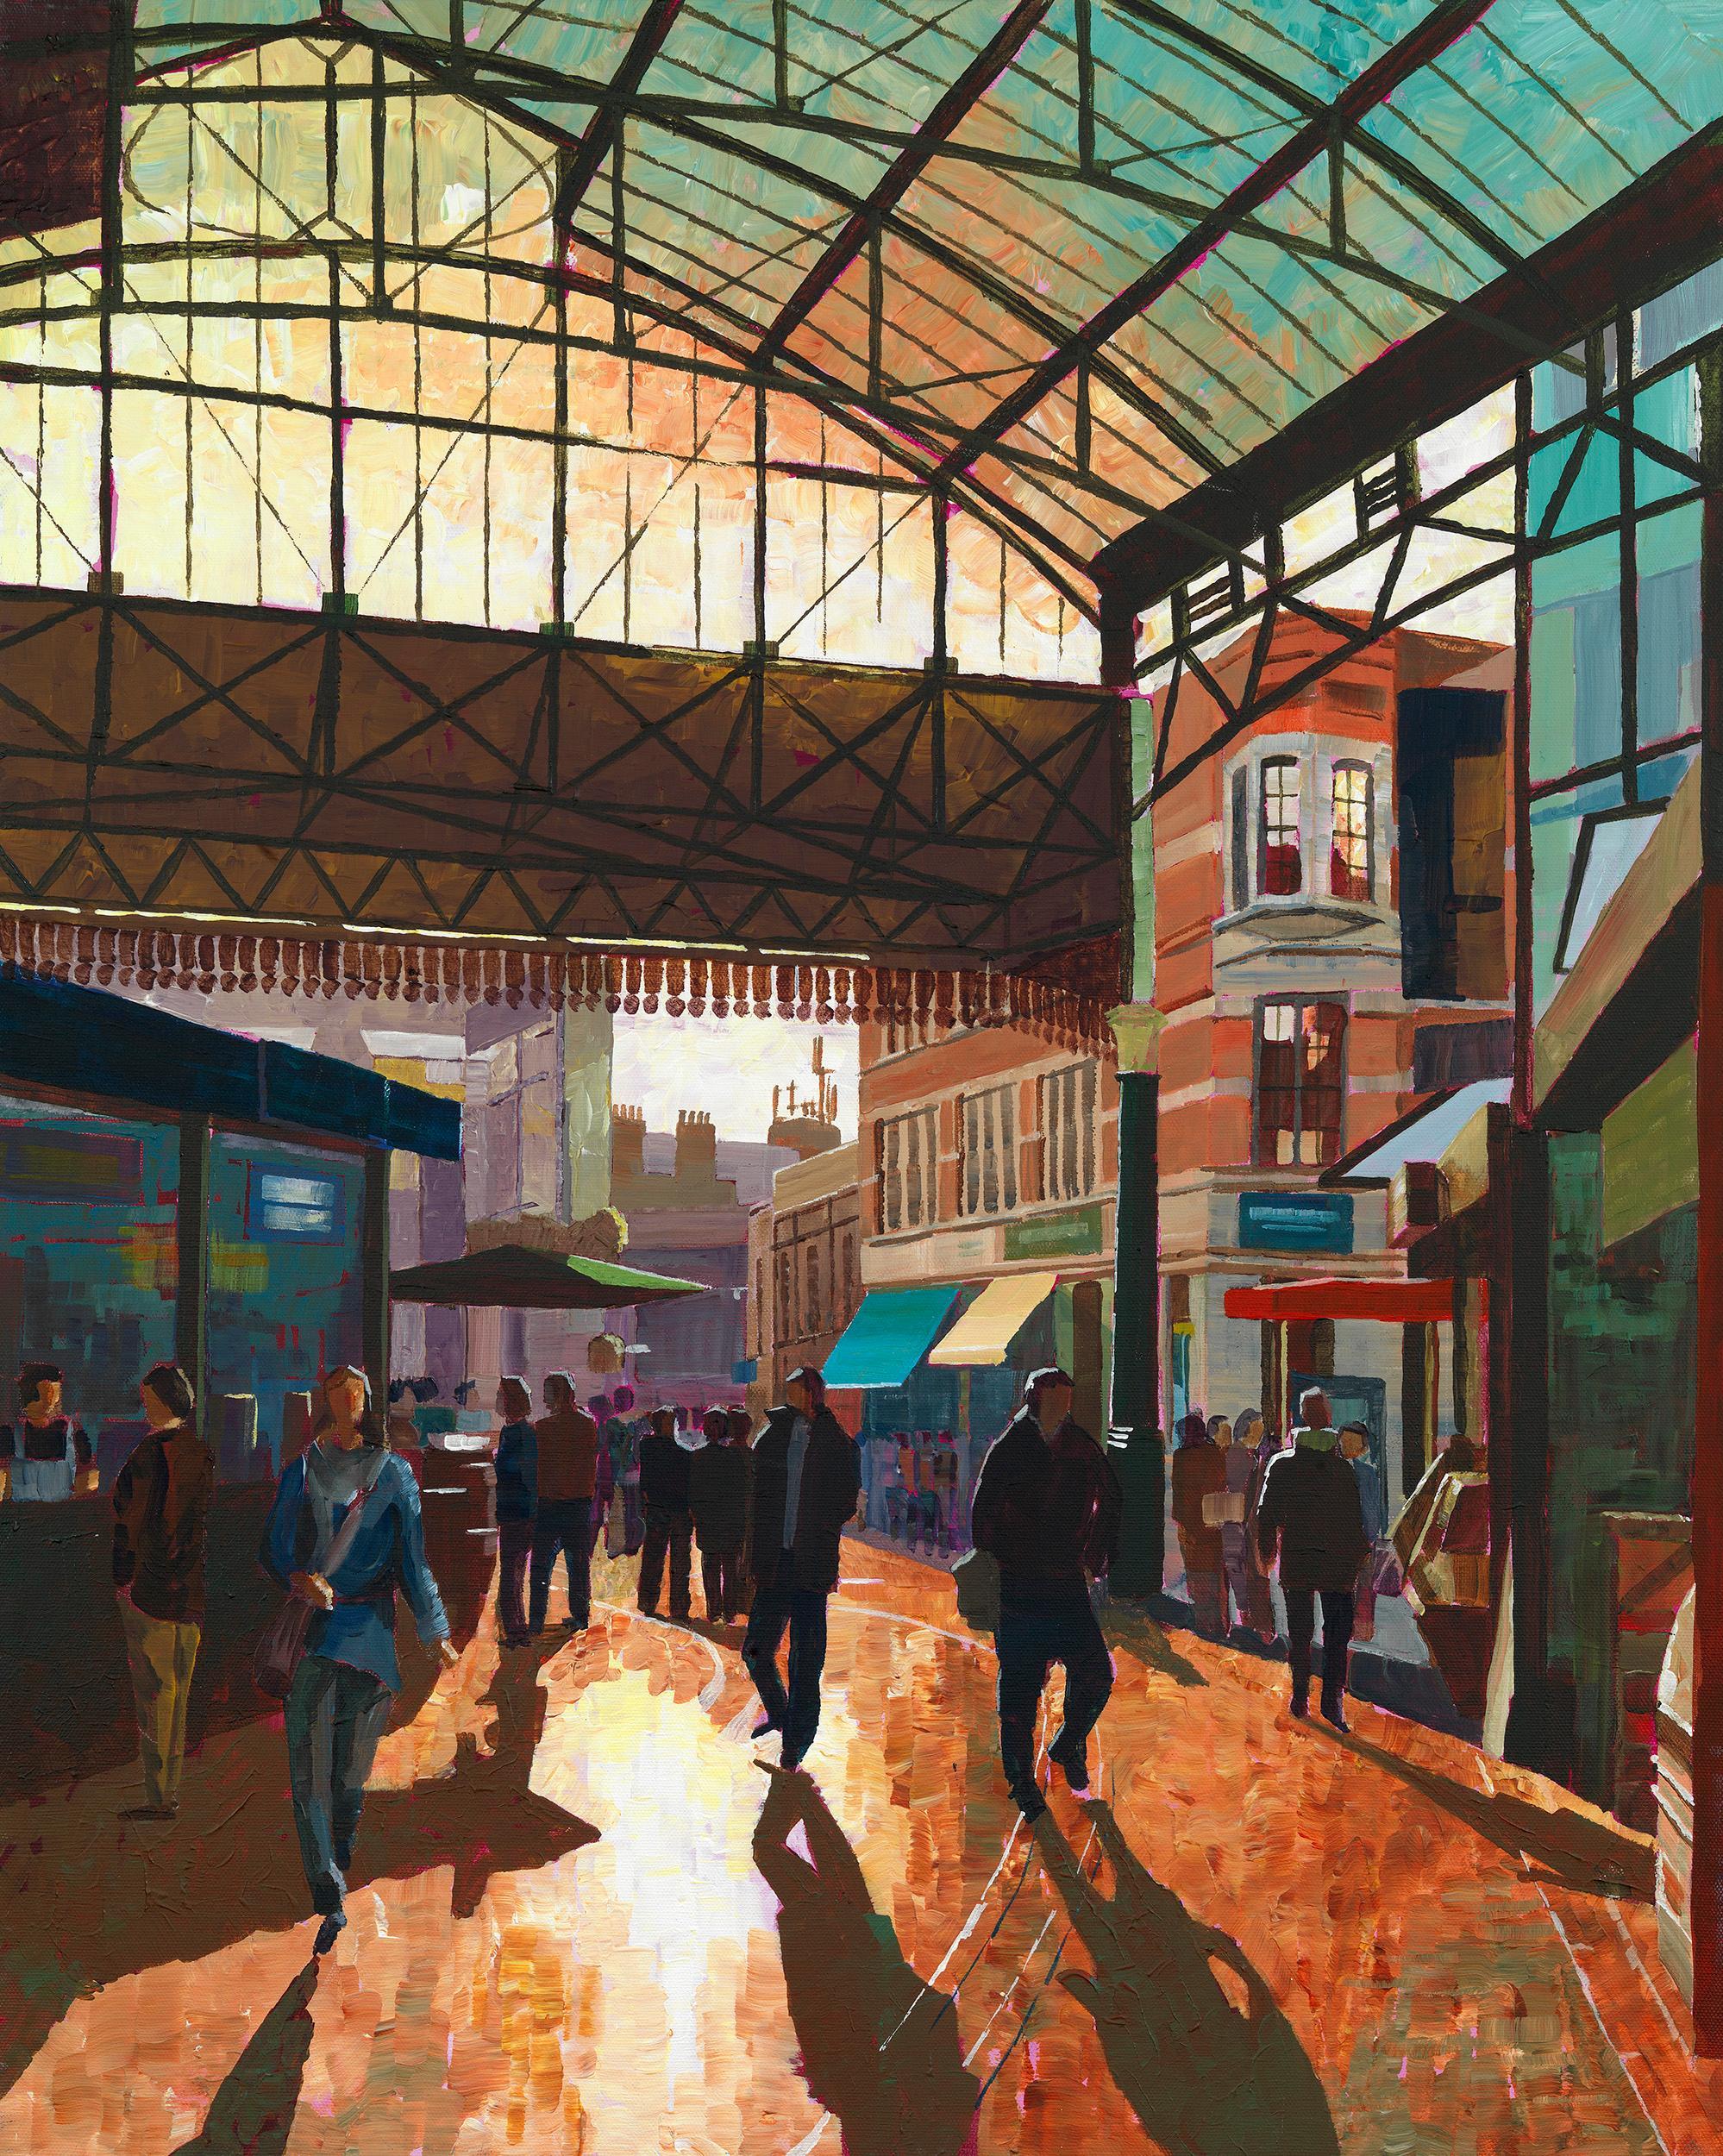 inter Sun in Borough Market - London colour city landscape painting contemporary